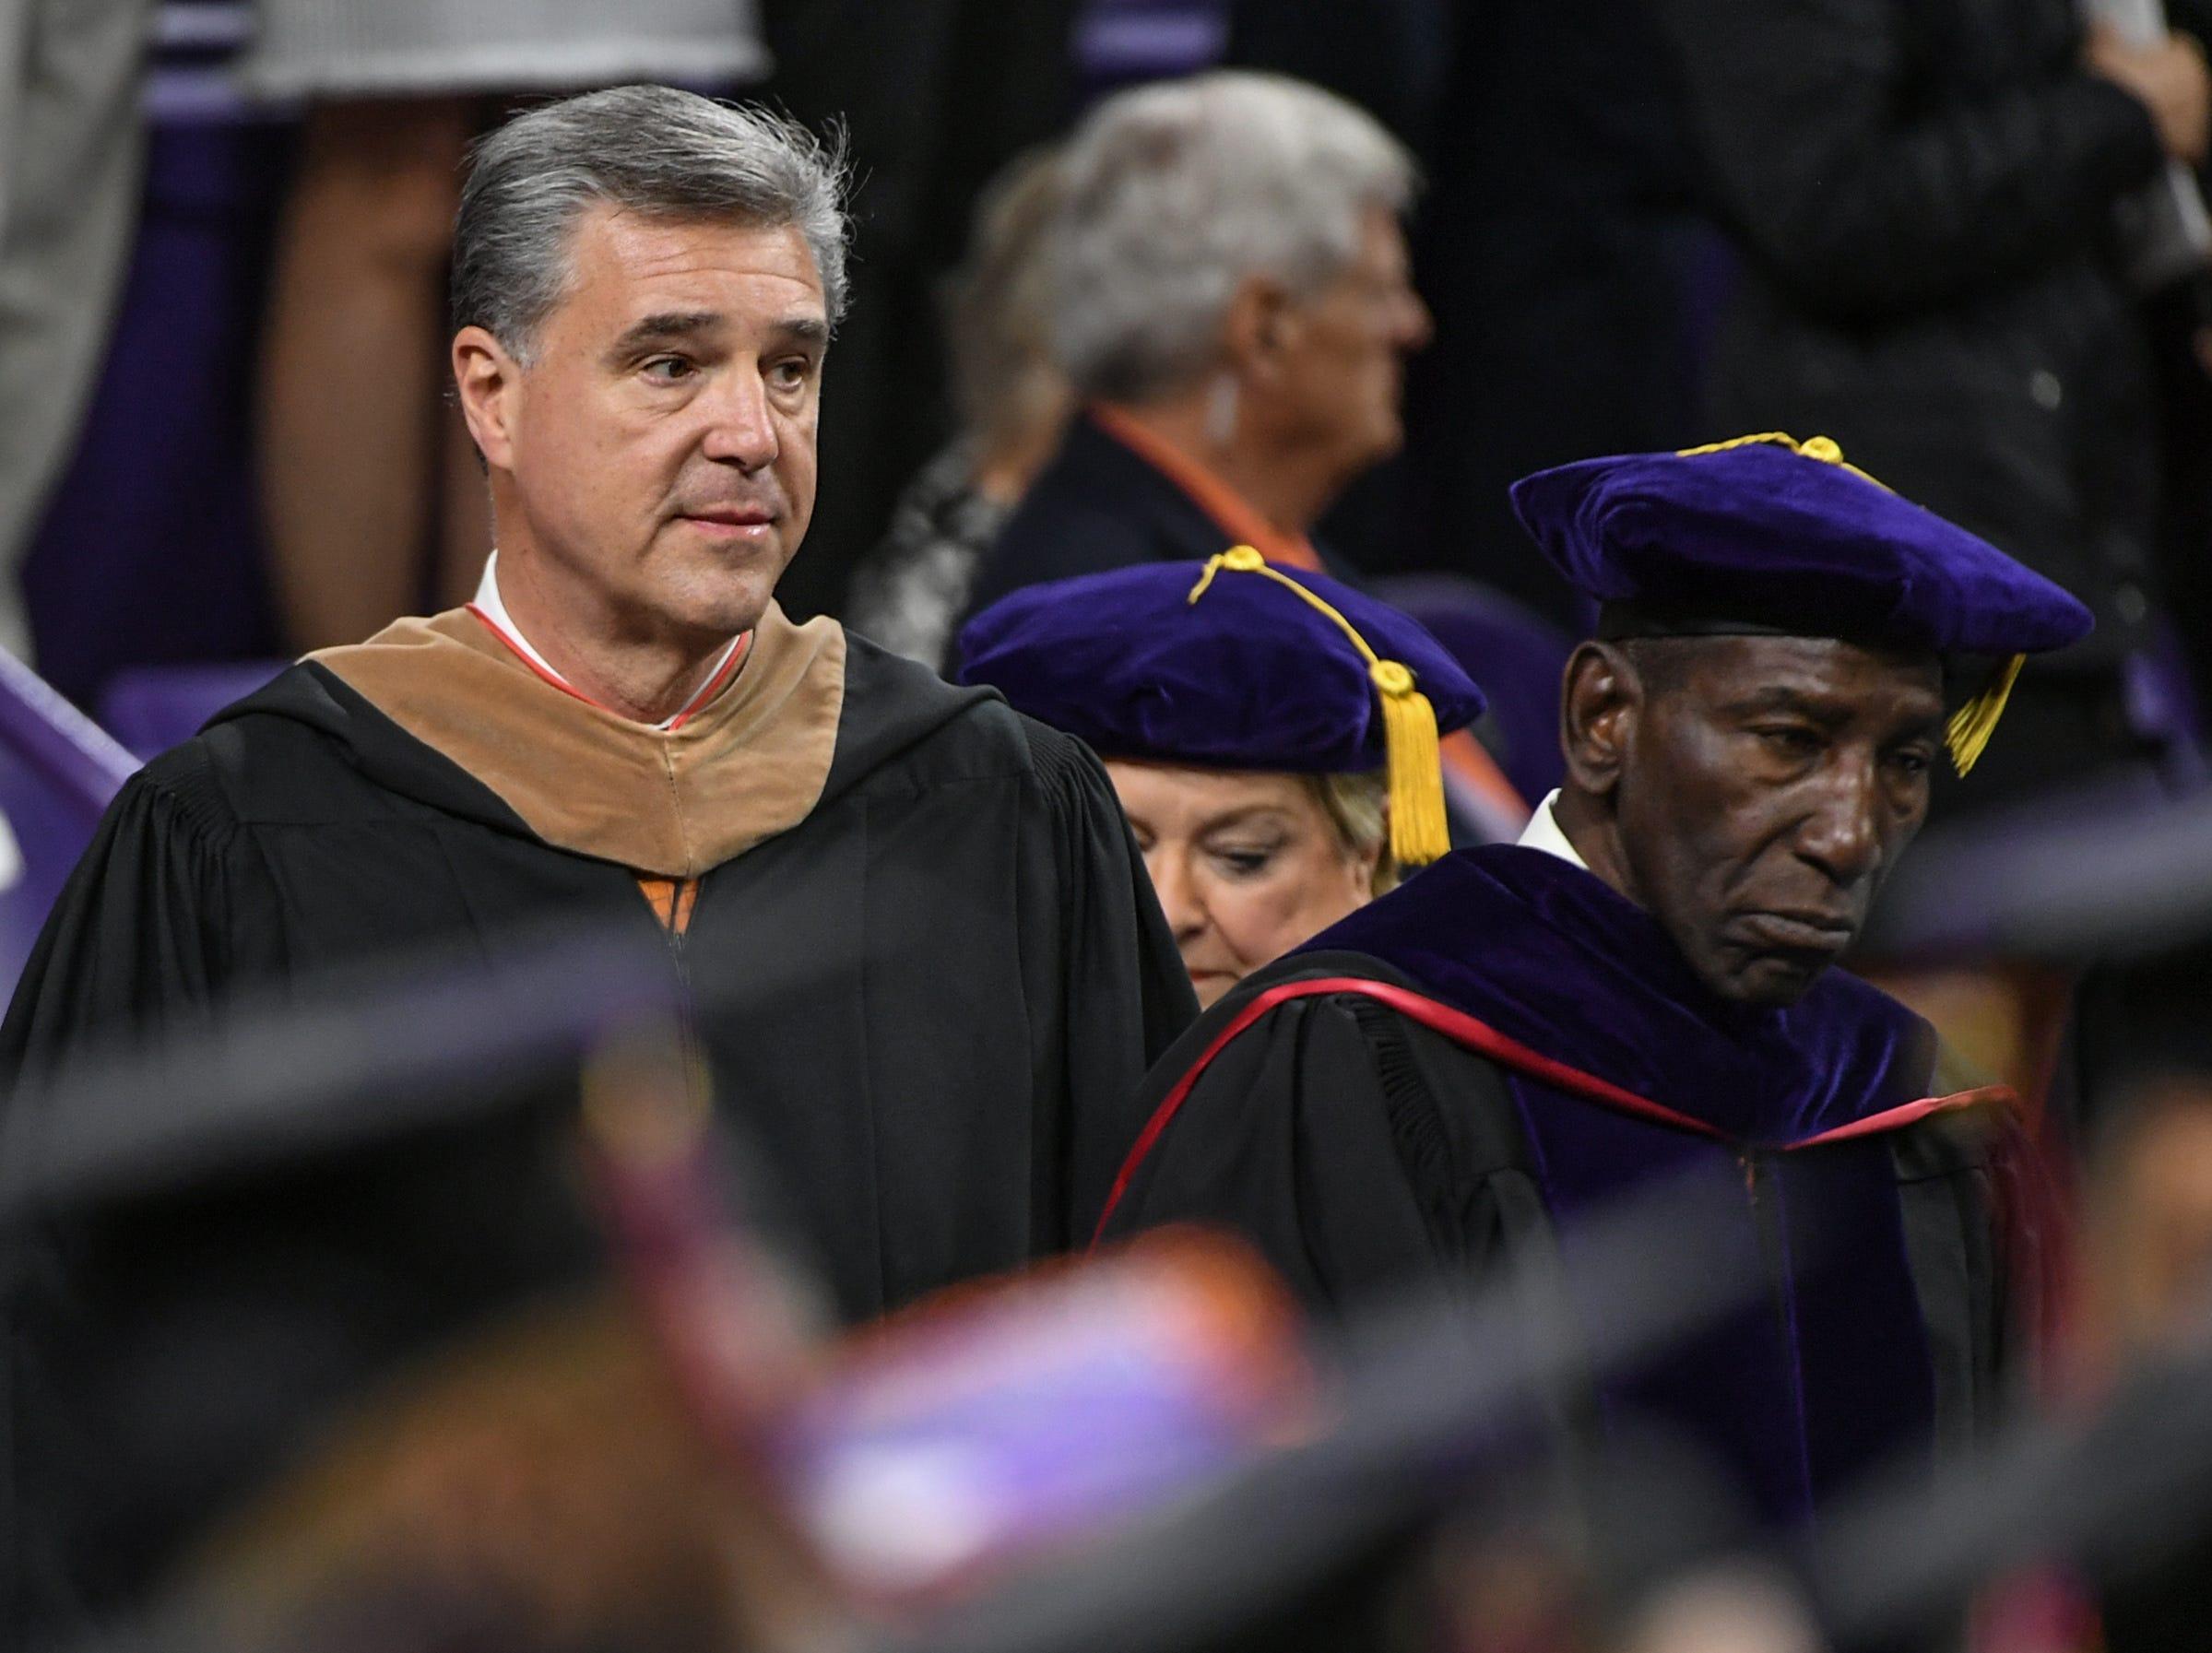 Dan Radakovich, Clemson Athletic Director, during Clemson University commencement ceremonies in Littlejohn Coliseum in Clemson Friday, May 10, 2019.